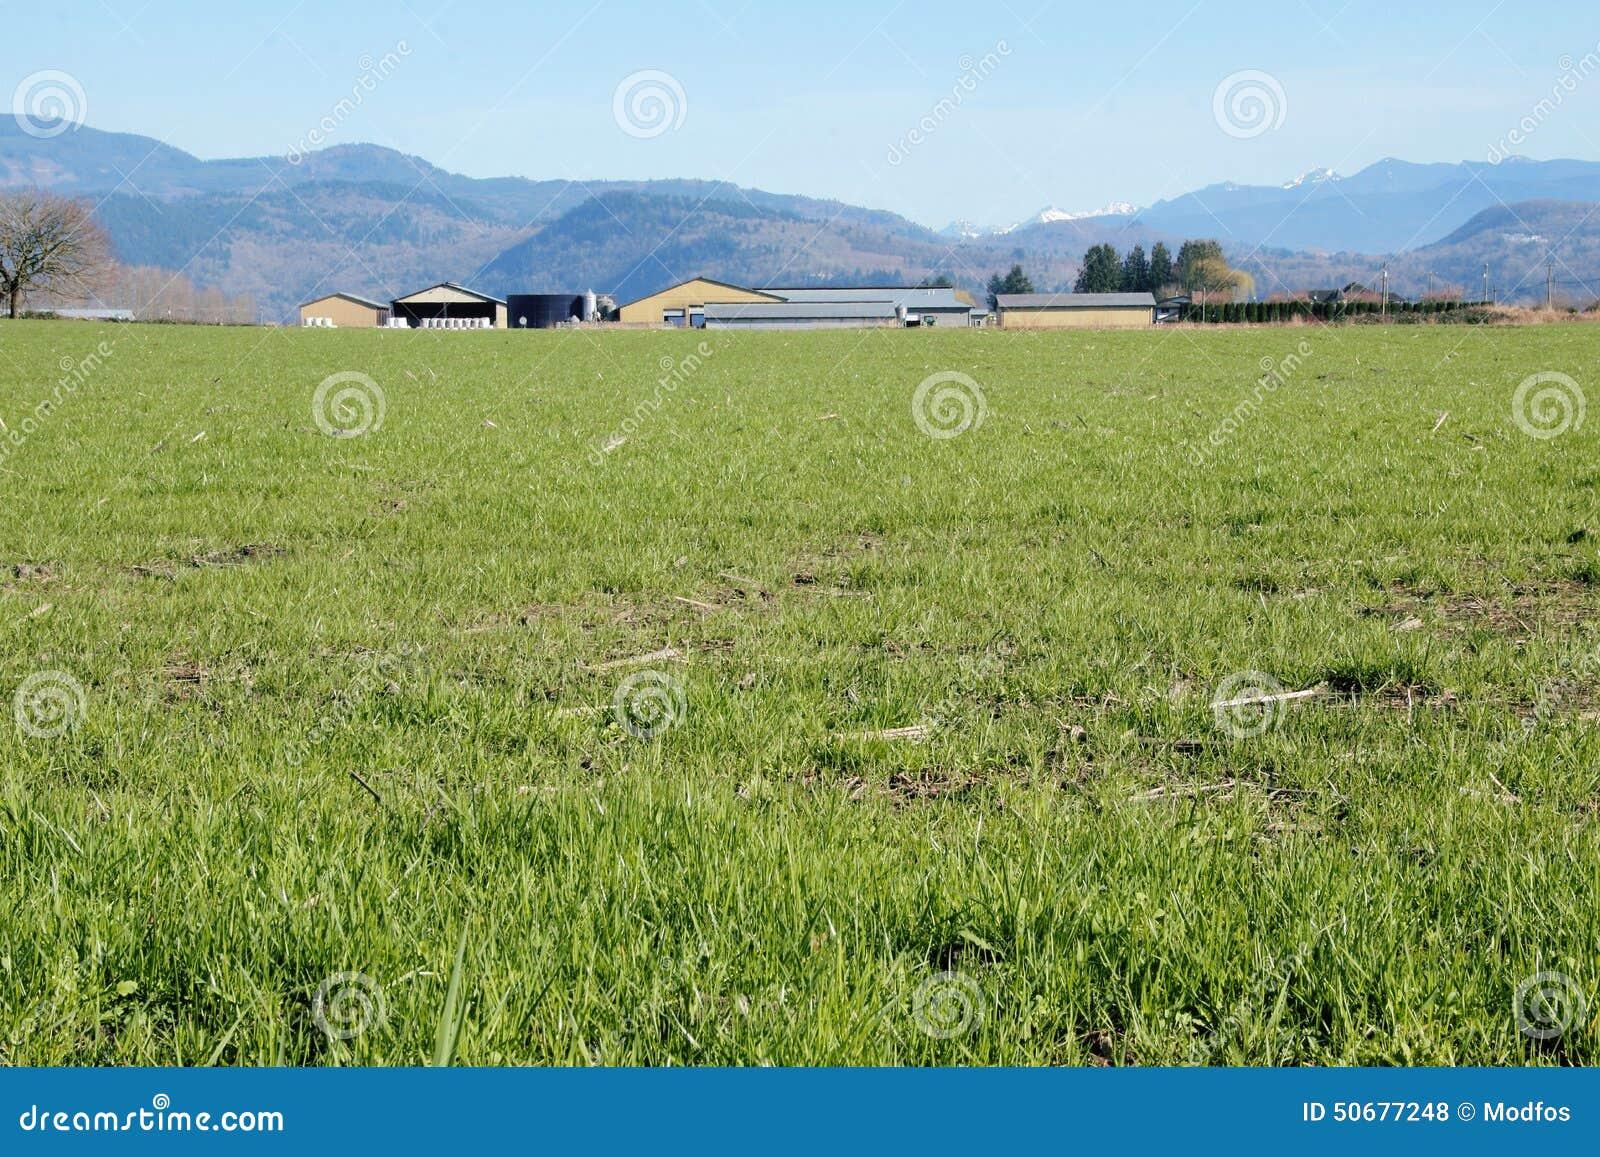 Download 谷农场和放牧地带 库存照片. 图片 包括有 产物, 成功, 有生产力, 农场, 横向, 现代, 绿色, 国内 - 50677248